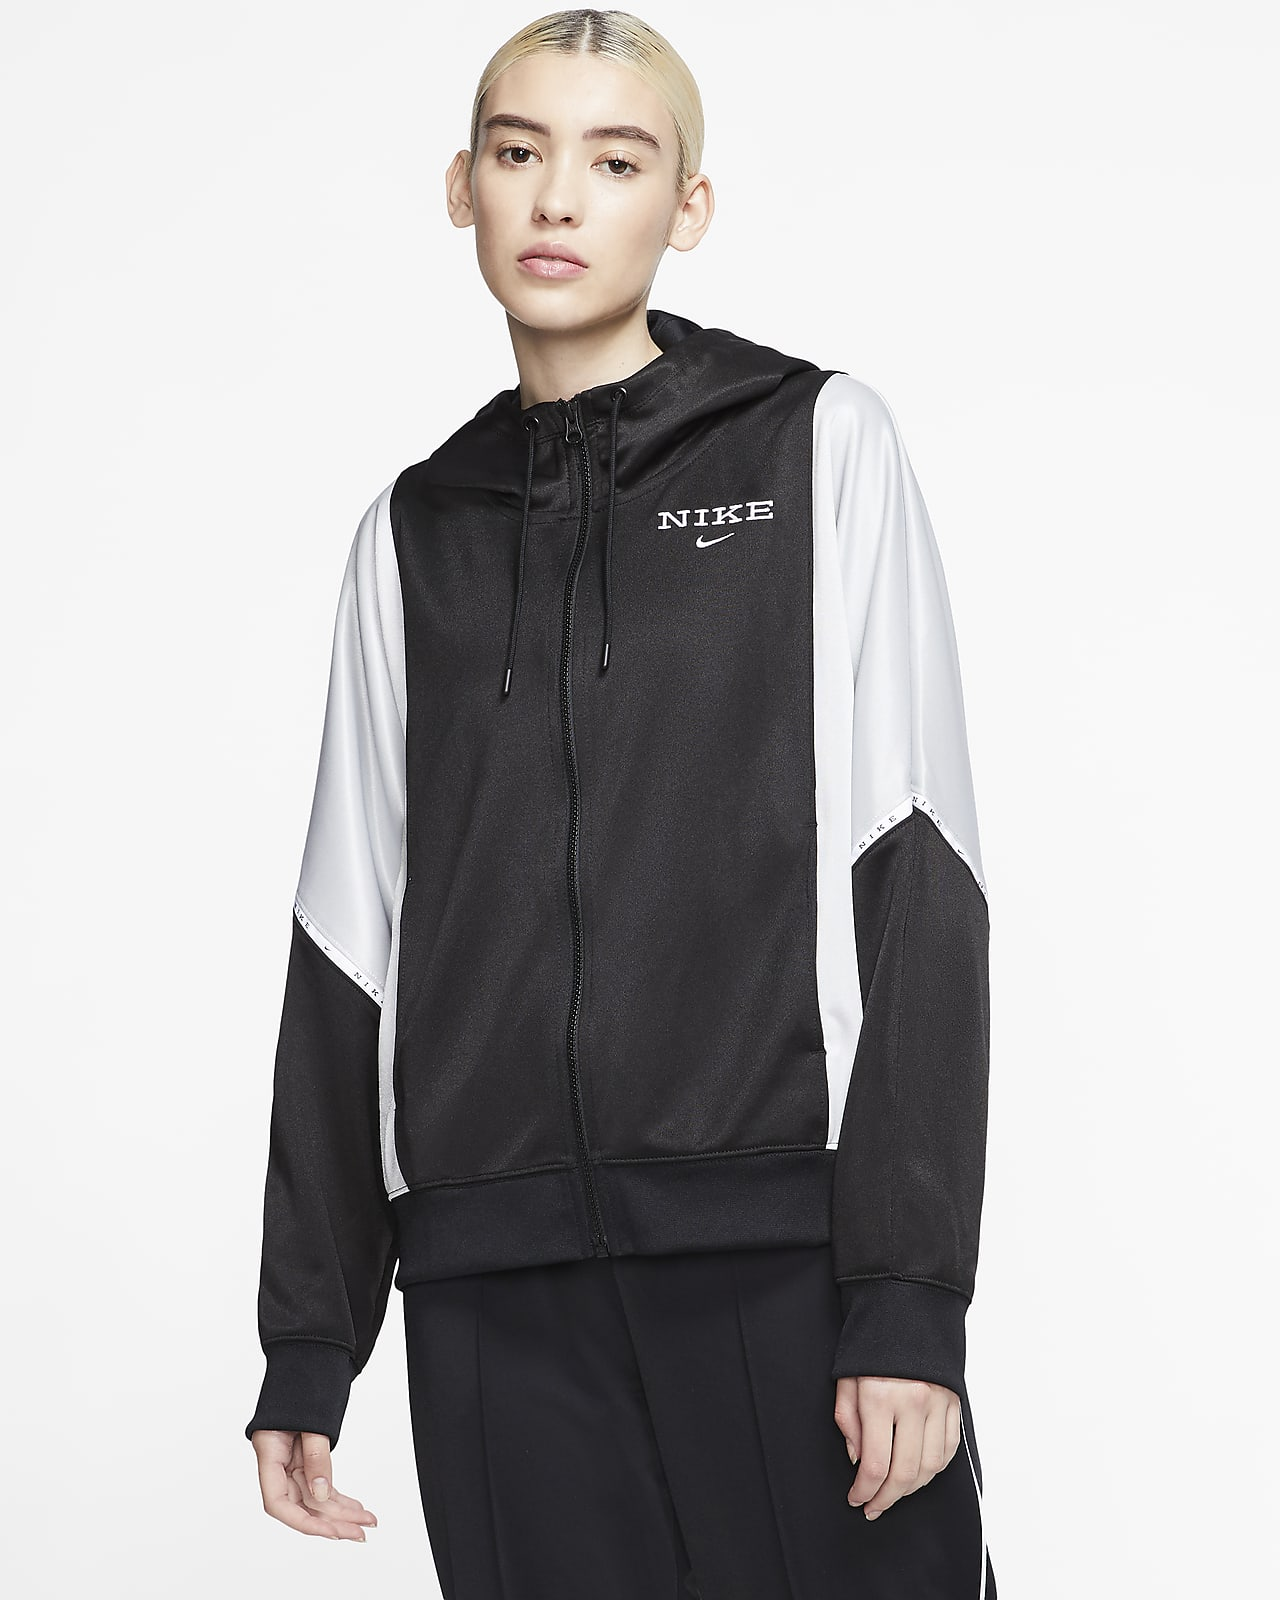 Nike Sportswear Damenjacke mit Kapuze und durchgehendem